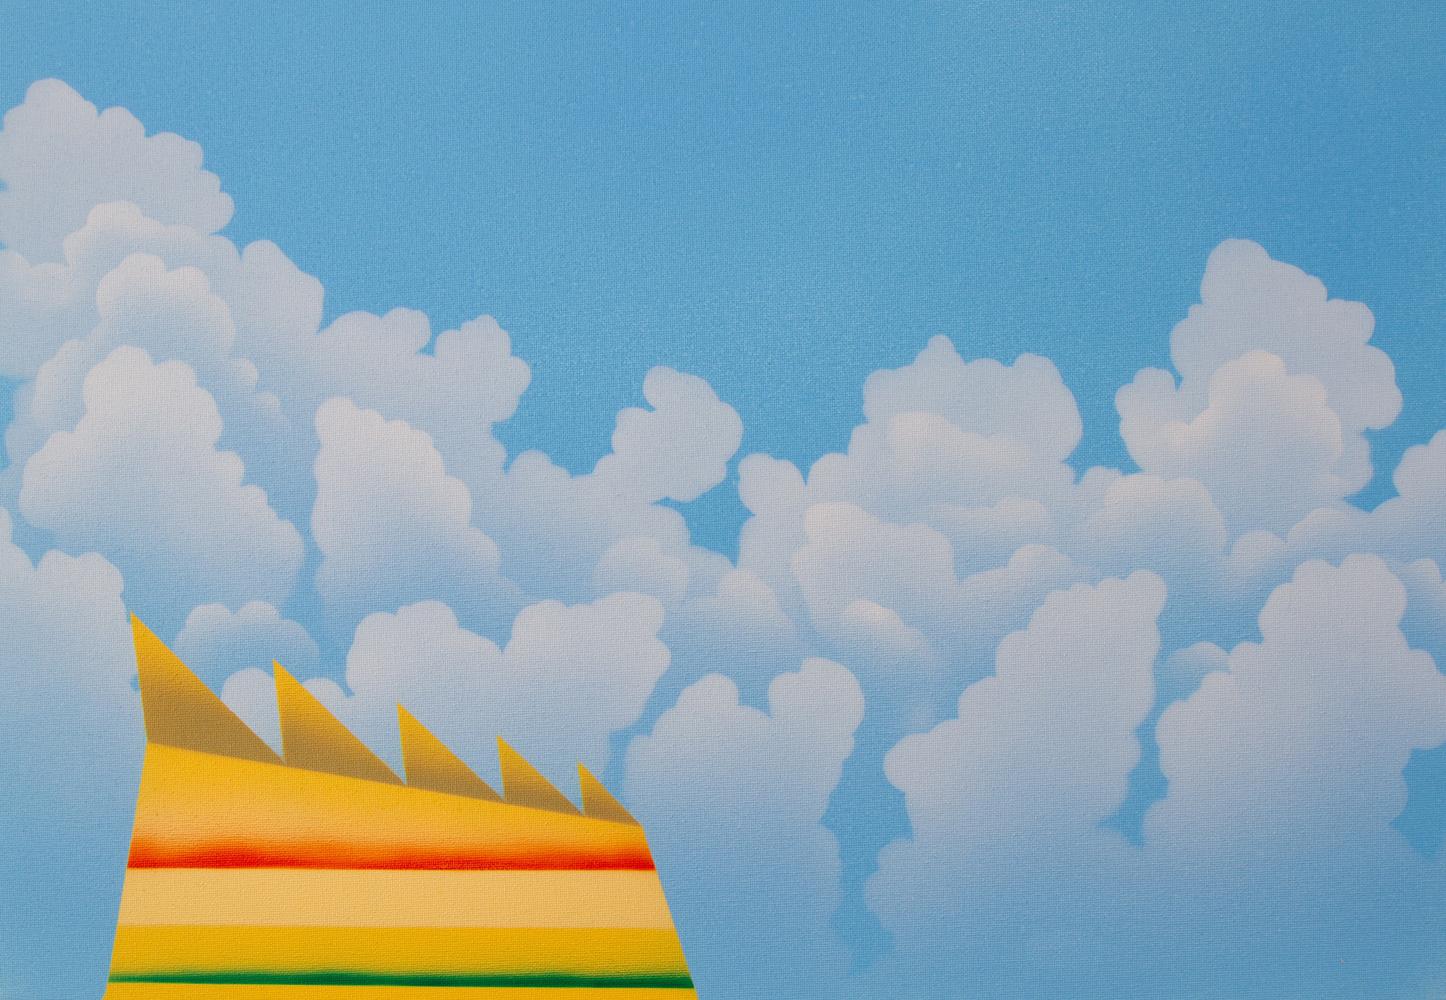 Matt Sellars, Profile, 2021, acrylic on canvas, 16 x 23 inches, $2000.